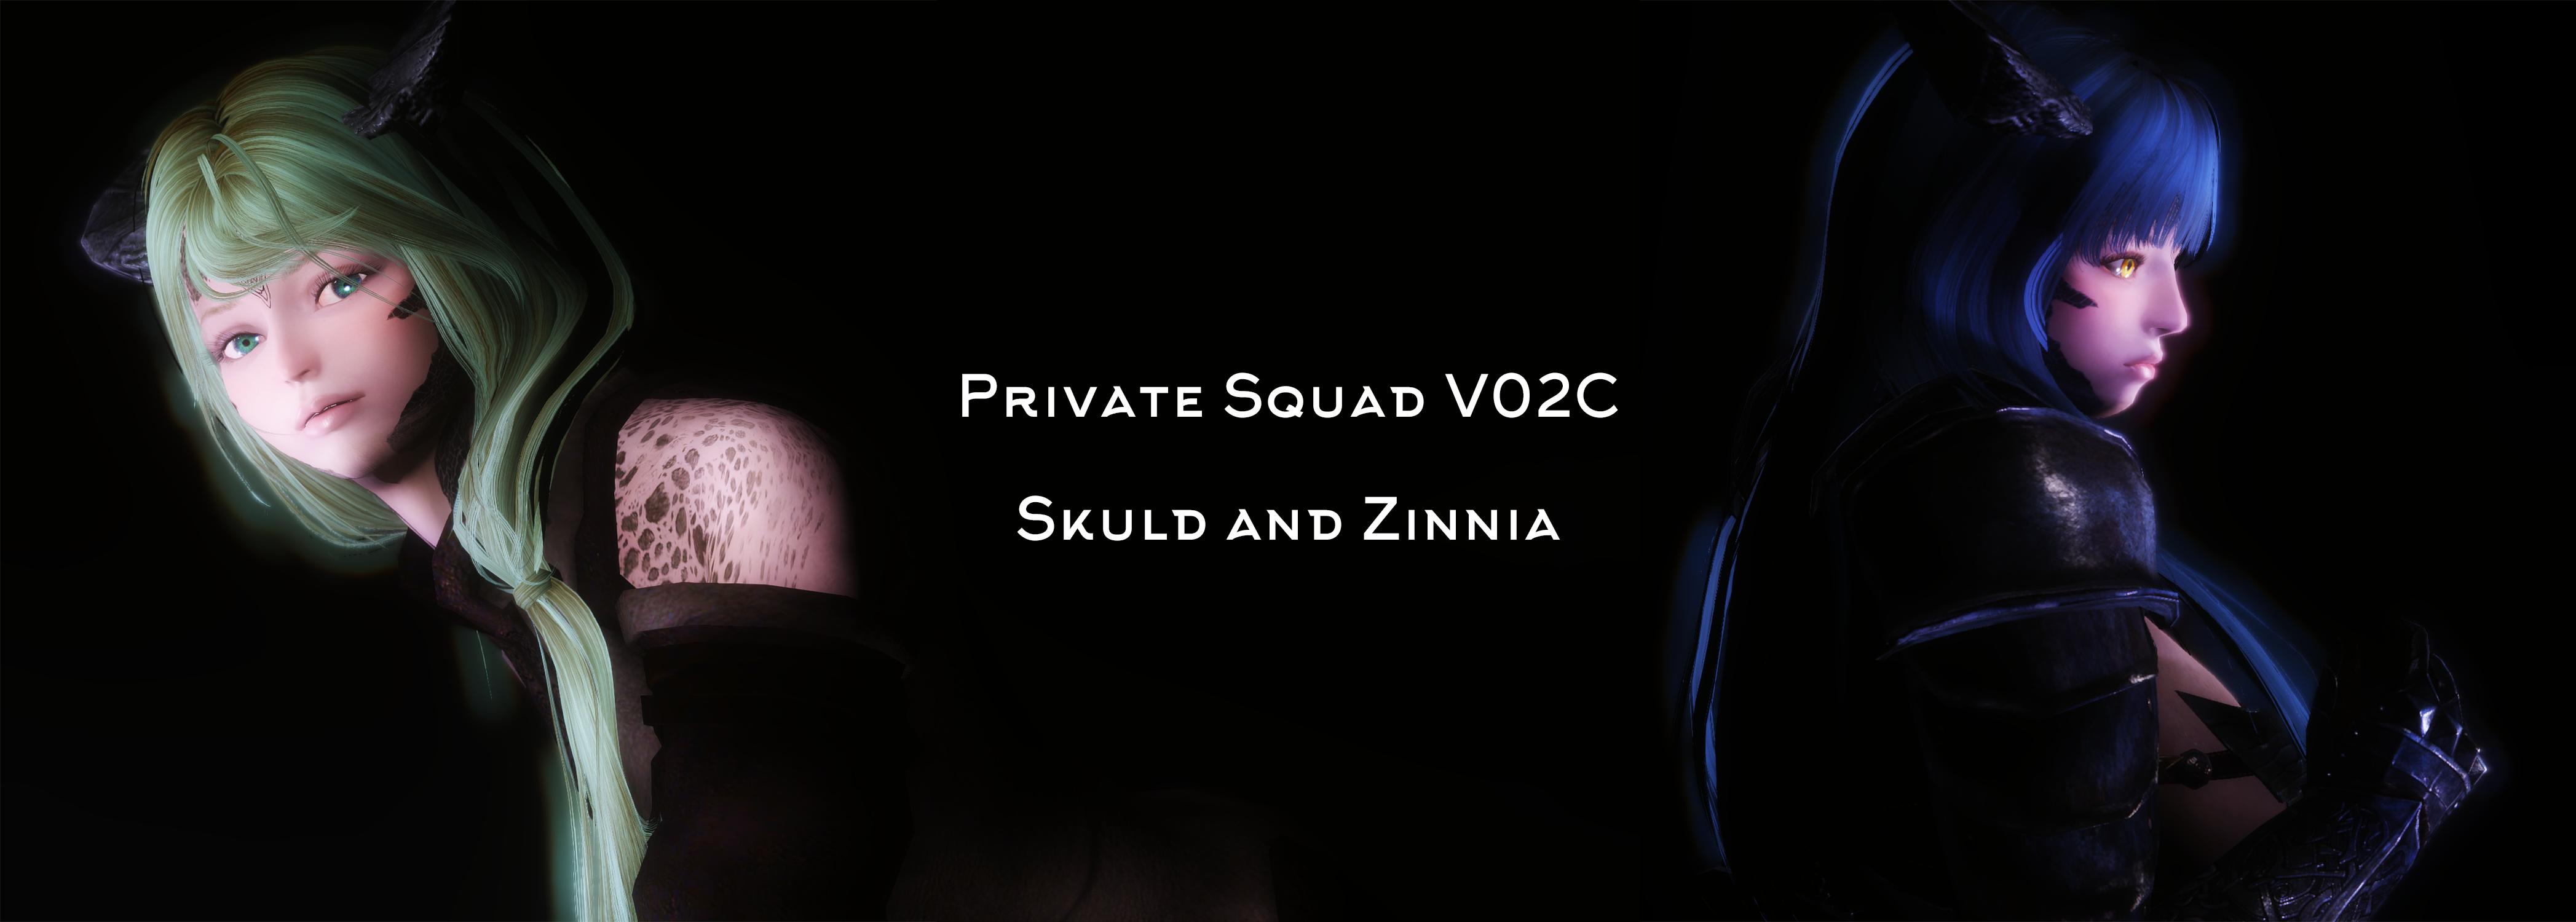 Private Squad V02C